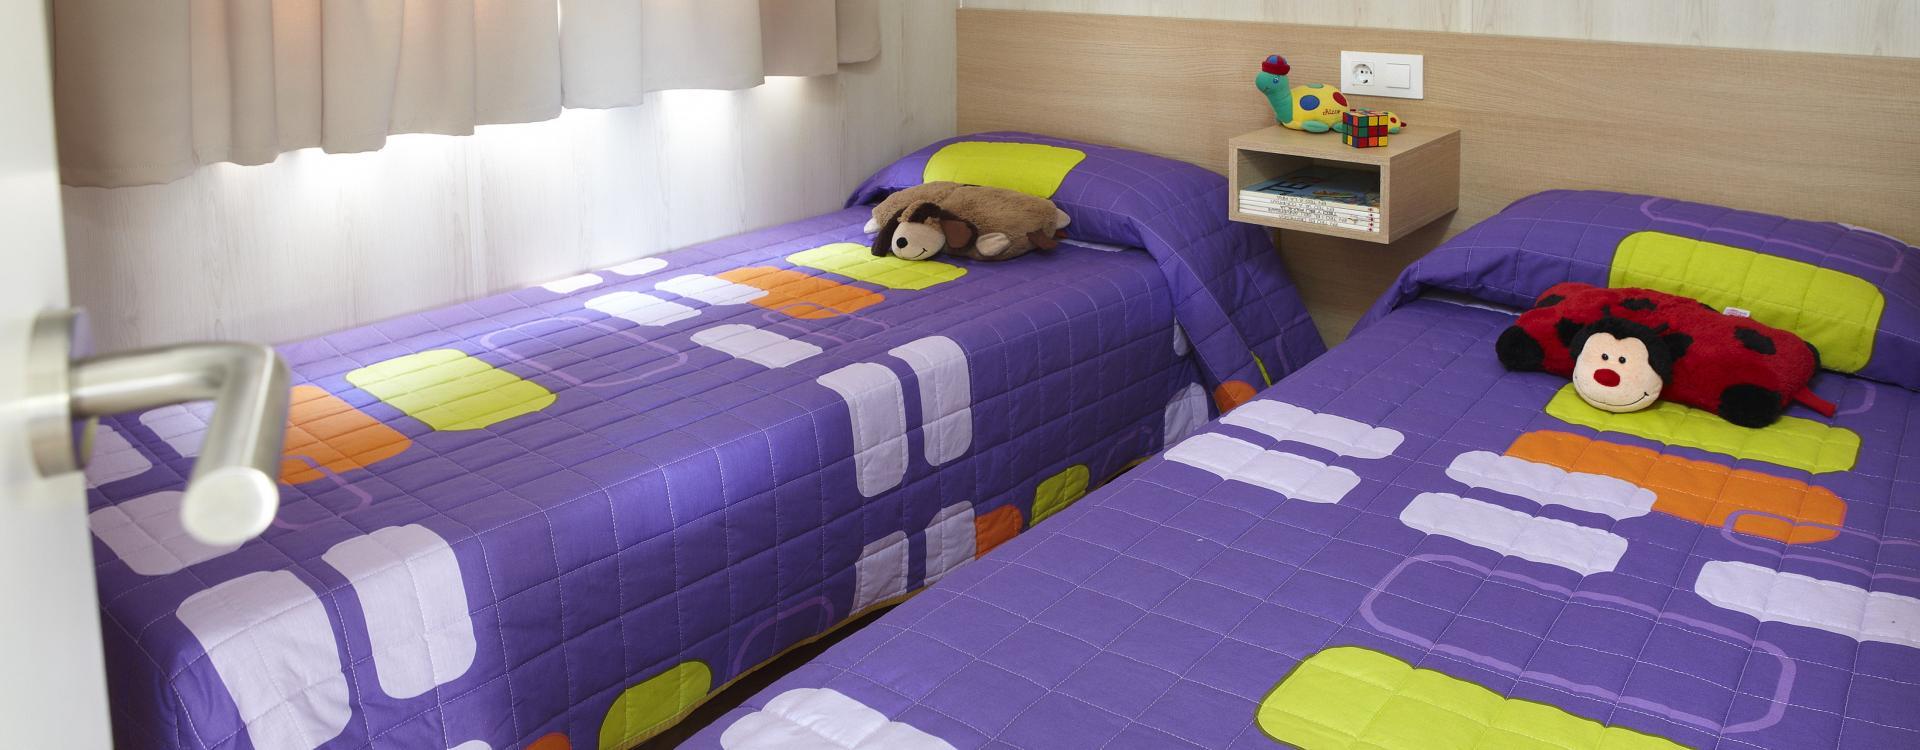 Deux lits Bungalow Ridaura